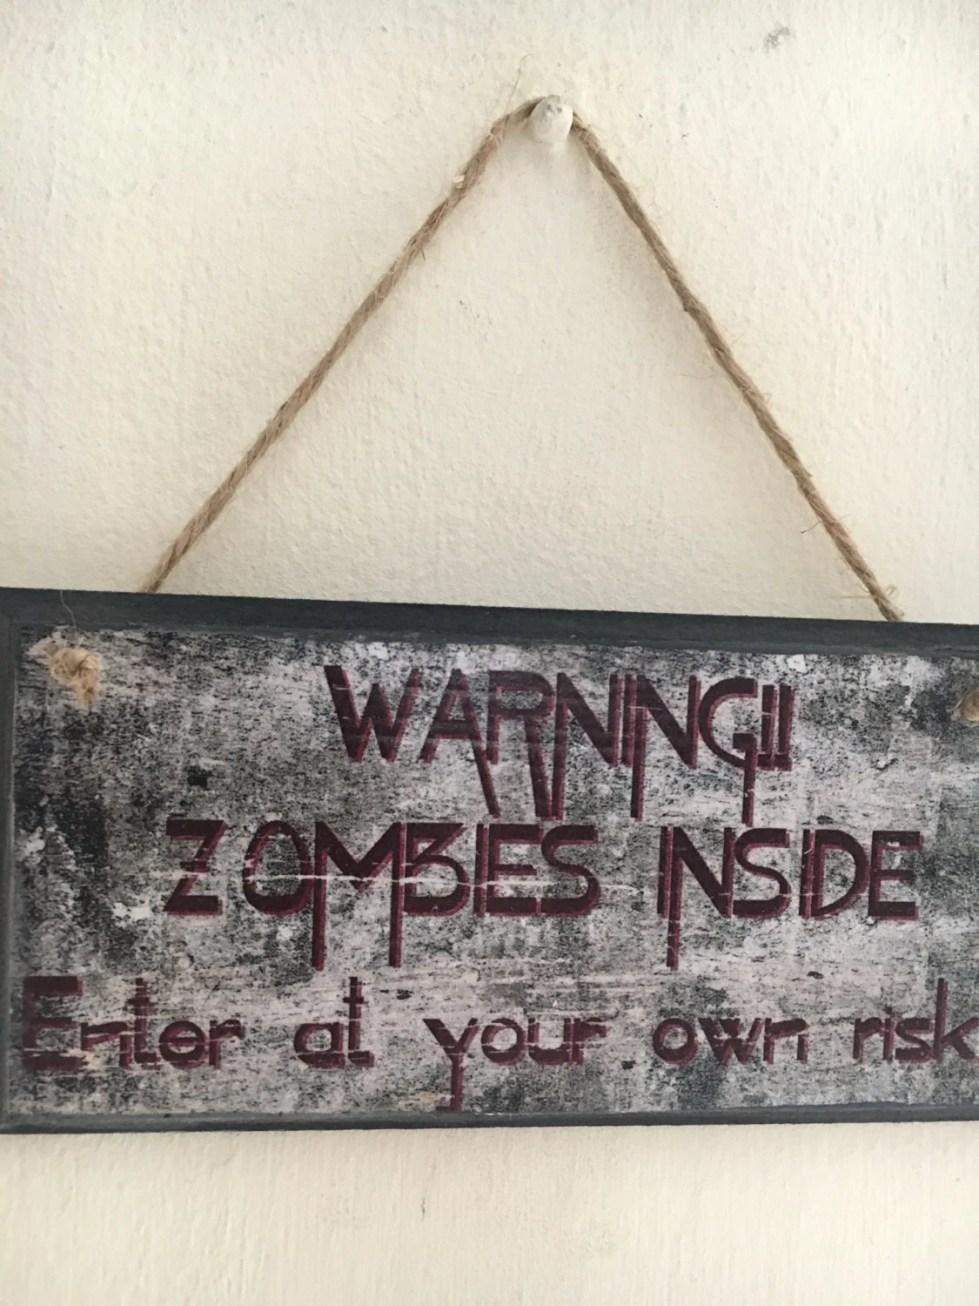 WARNING!! Zombies inside!...